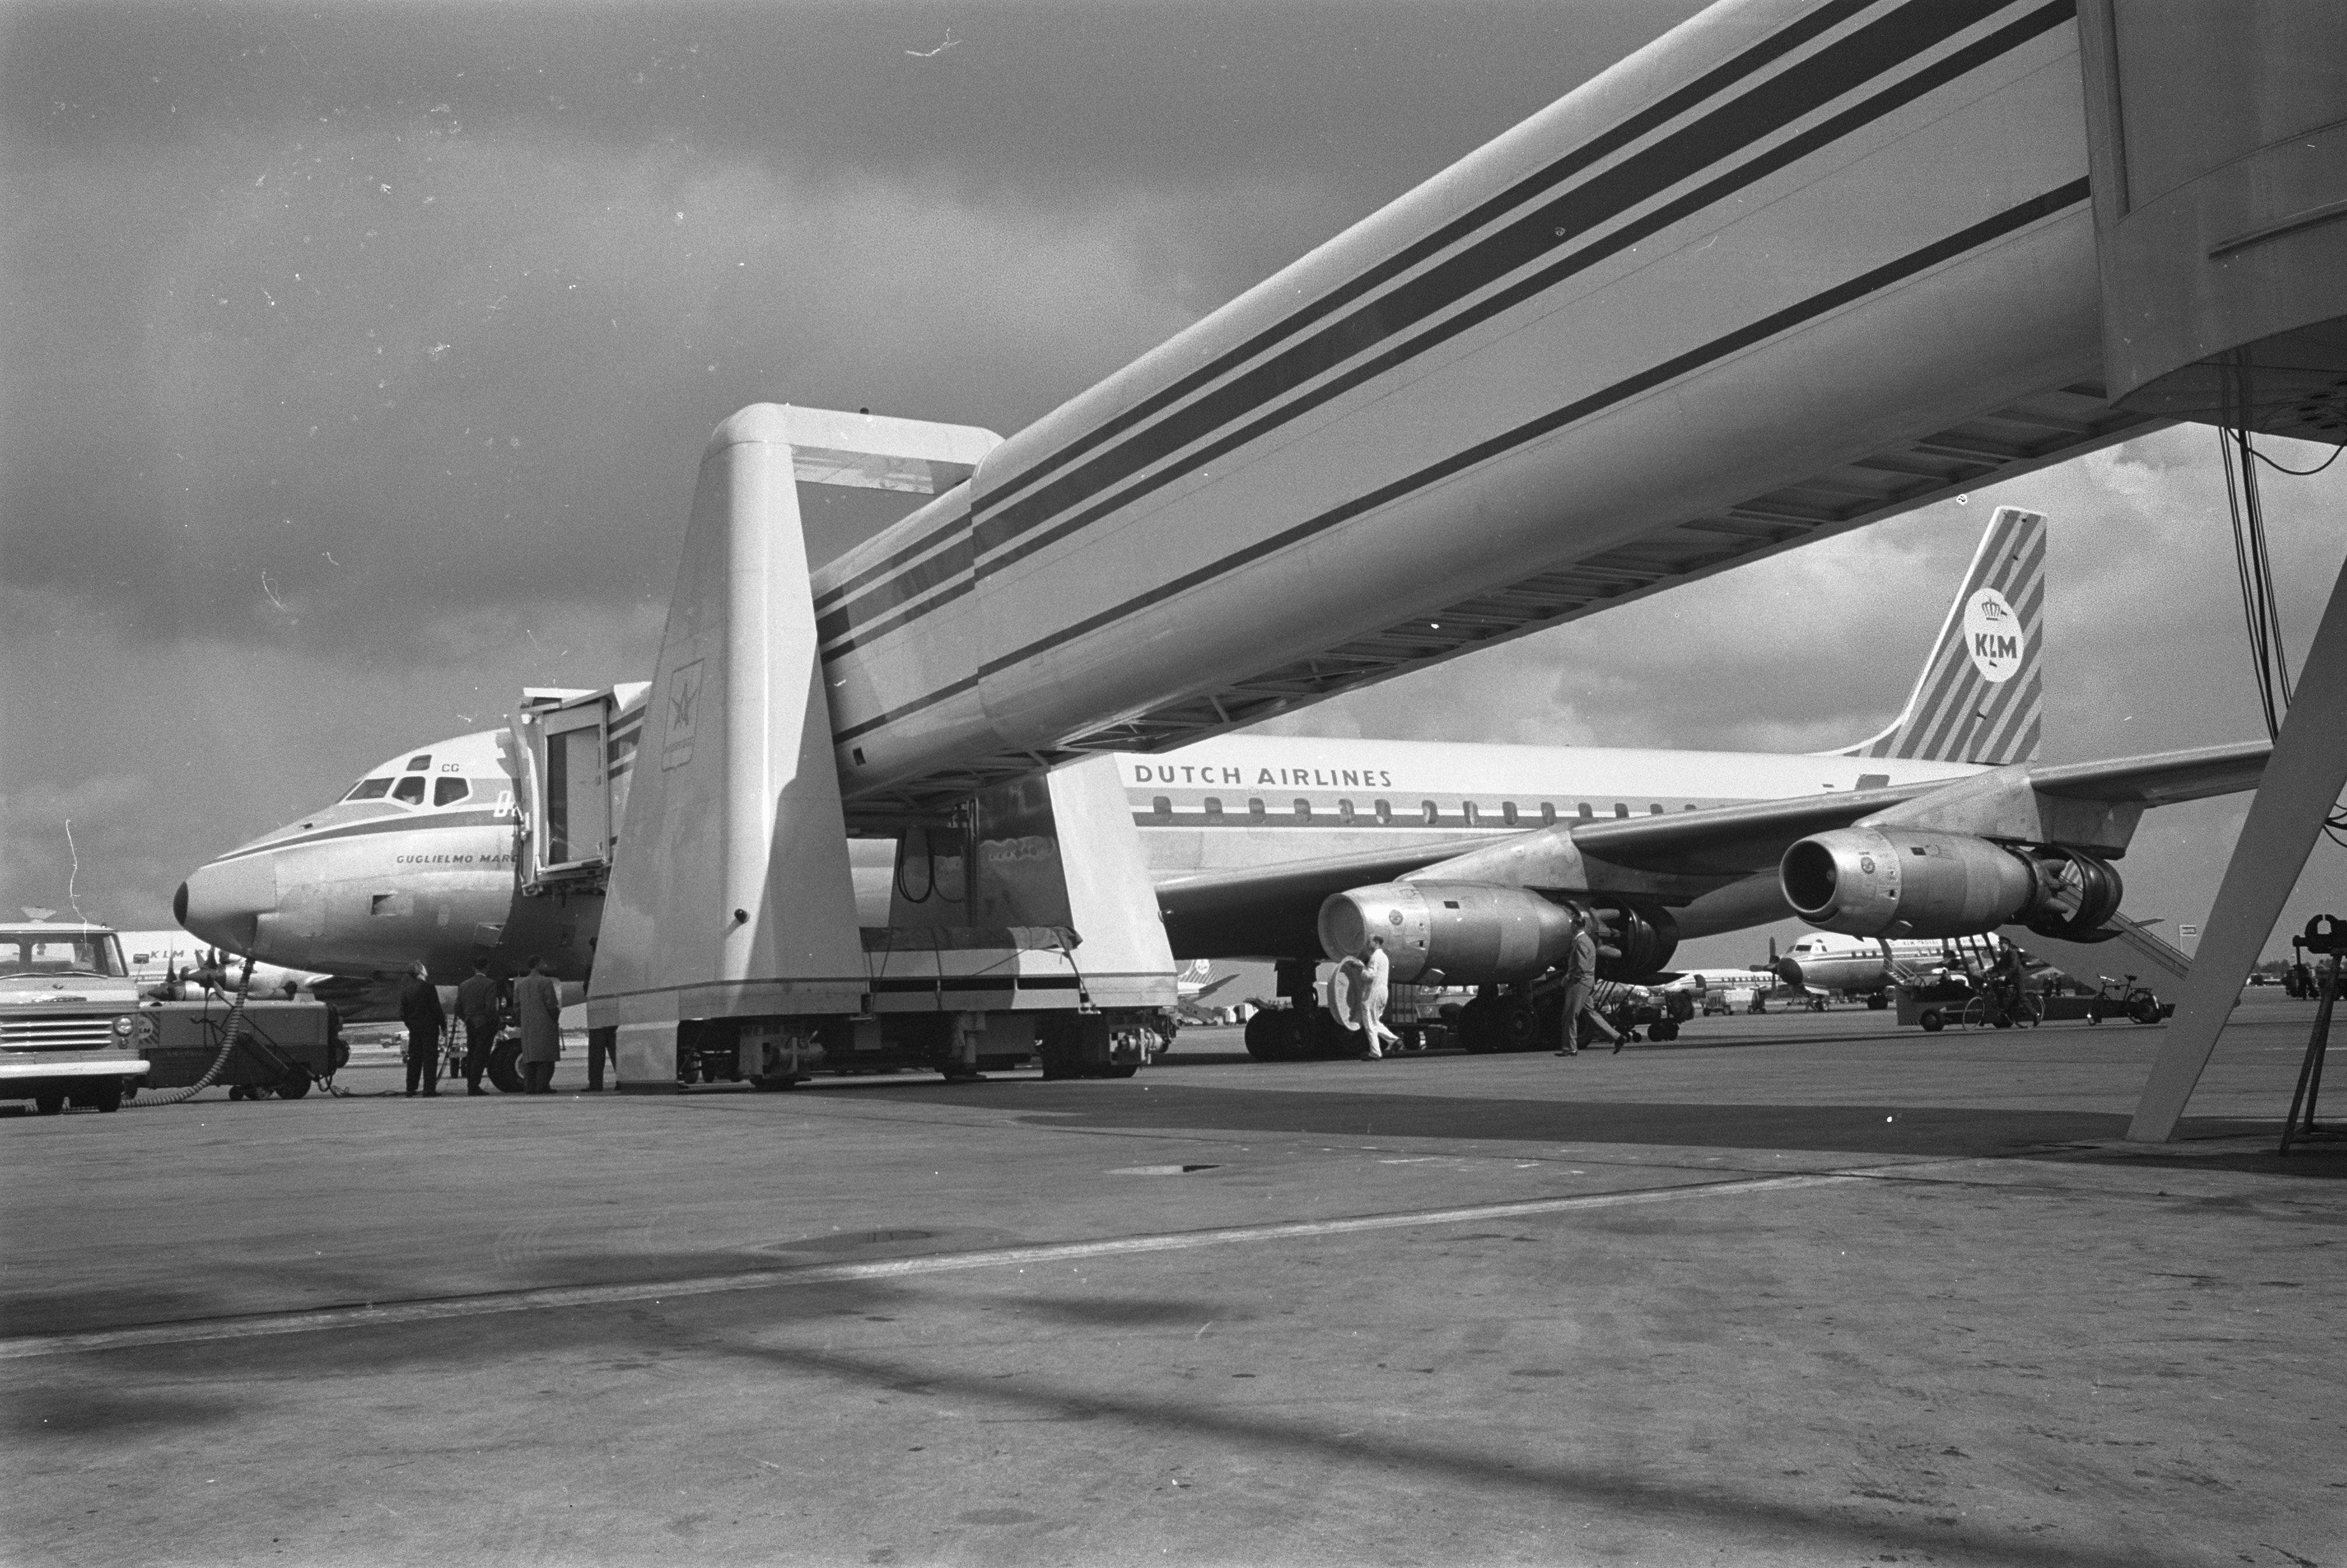 File:KLM Douglas DC-8 at an air bridge at Schiphol.jpg